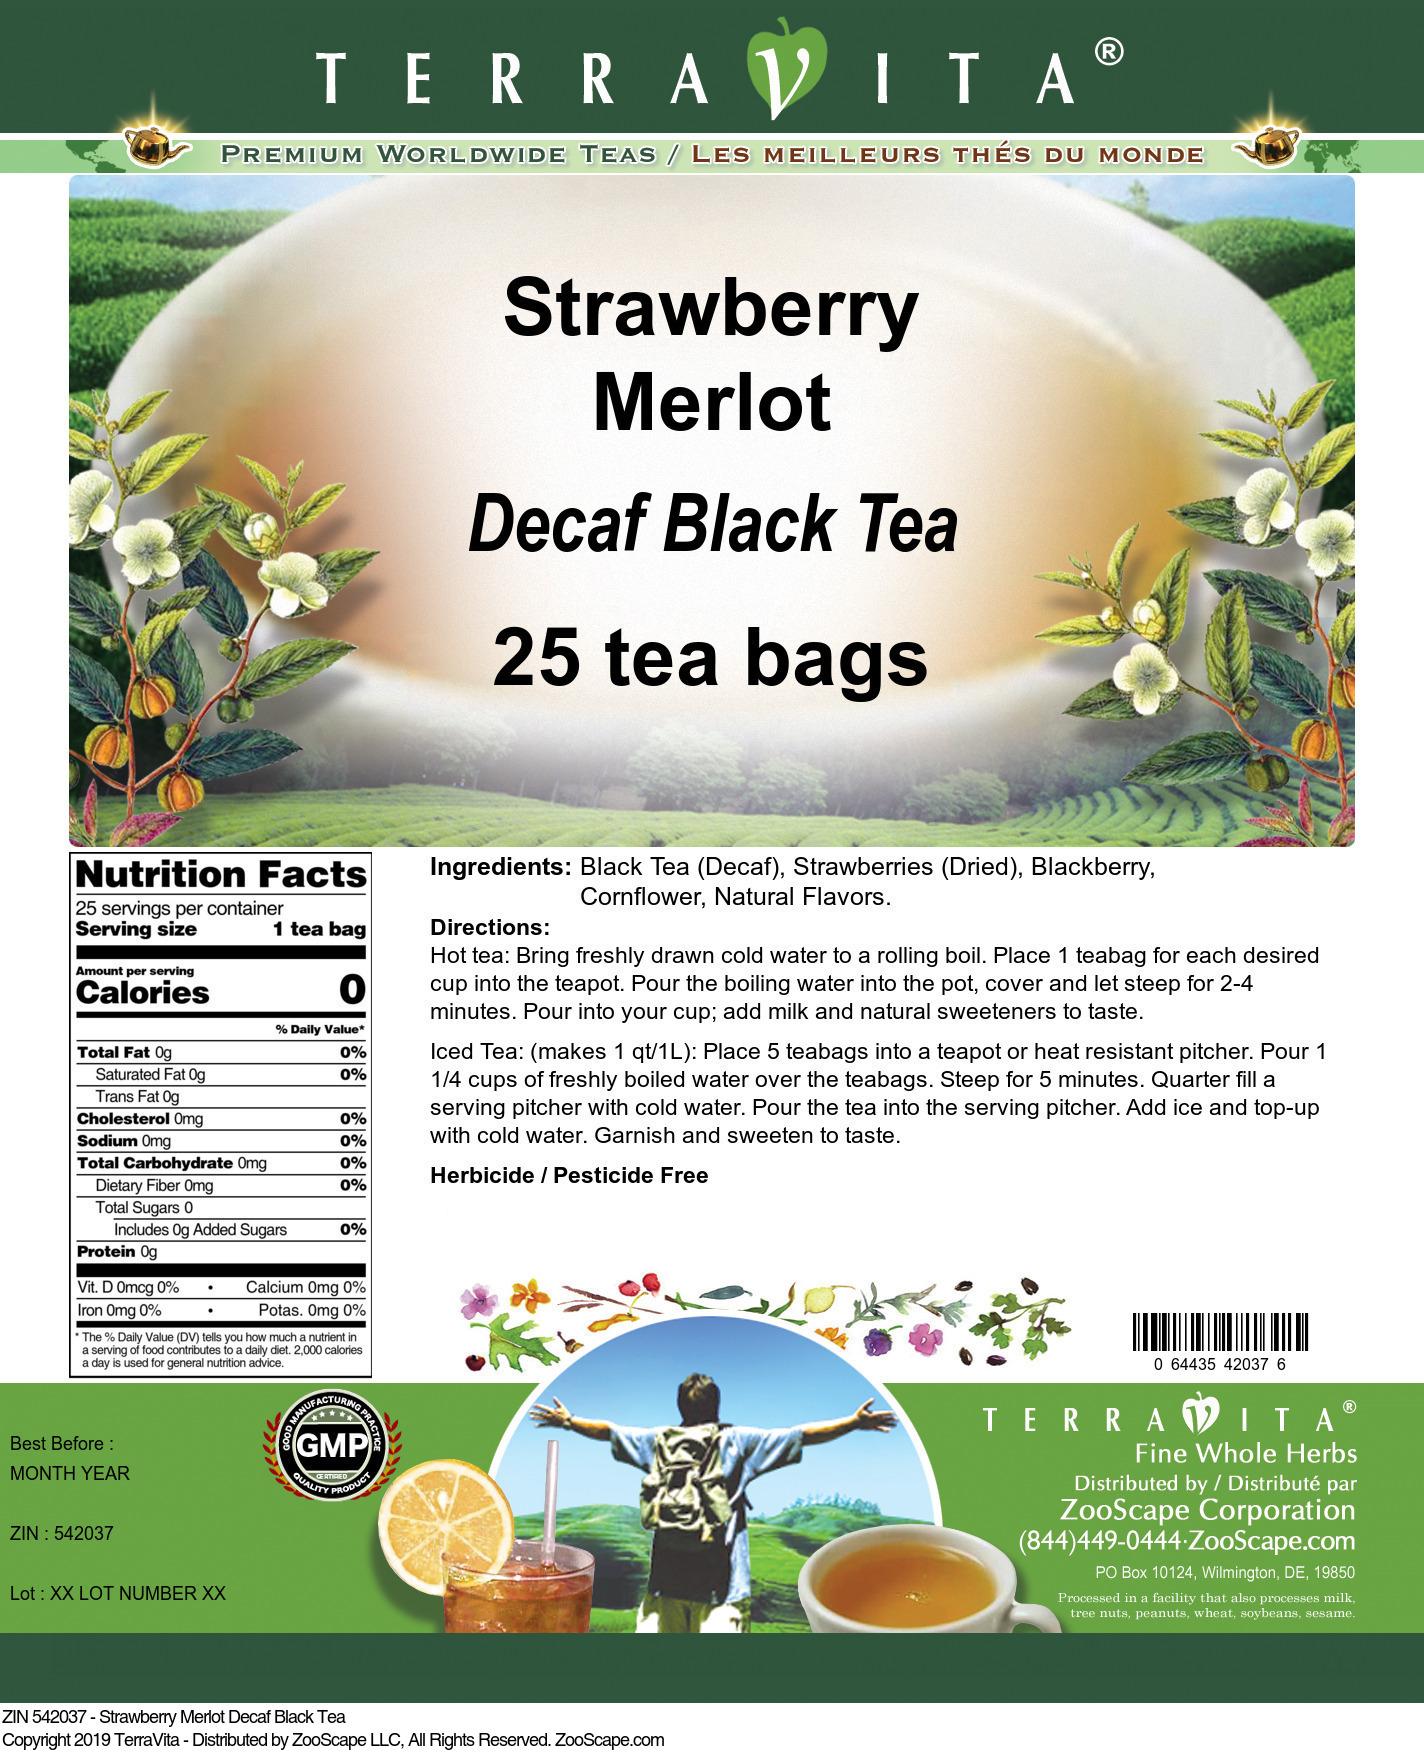 Strawberry Merlot Decaf Black Tea